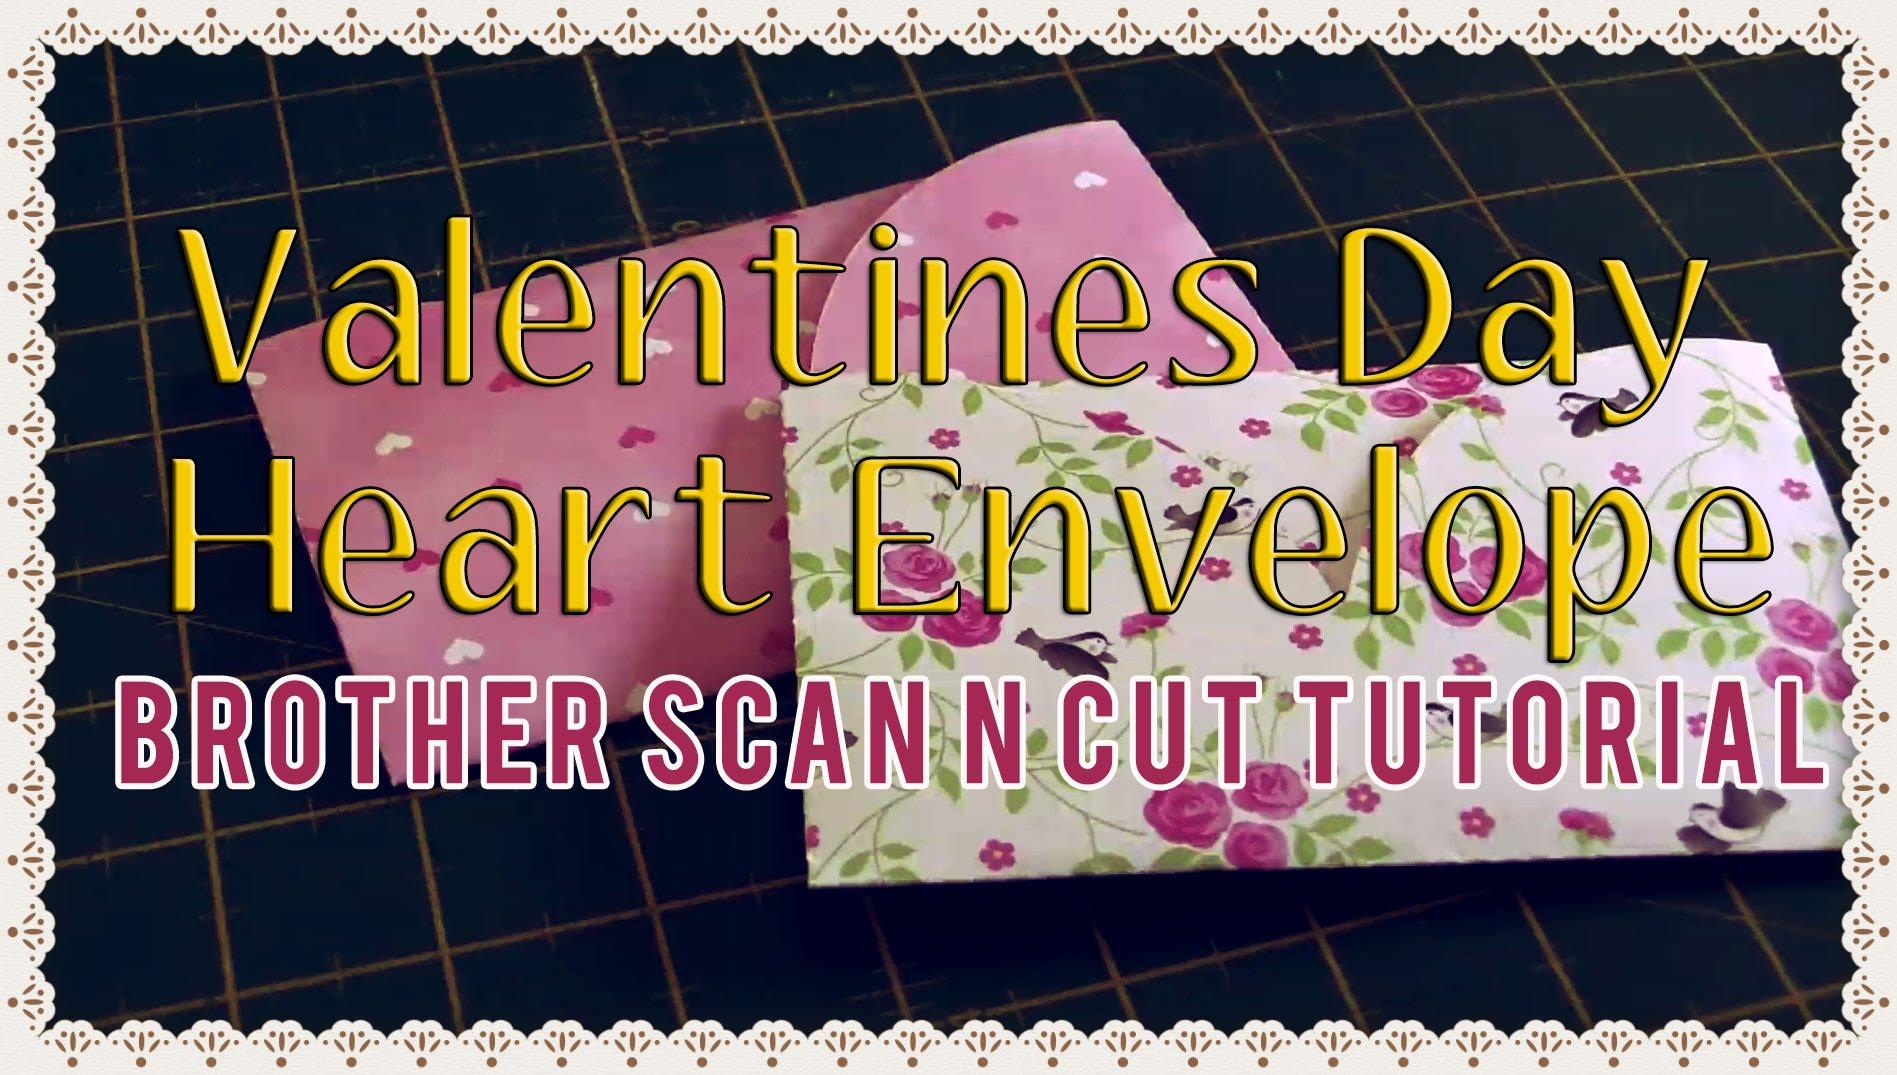 Brother Scan n Cut tutorial: Valentine's Heart Envelope